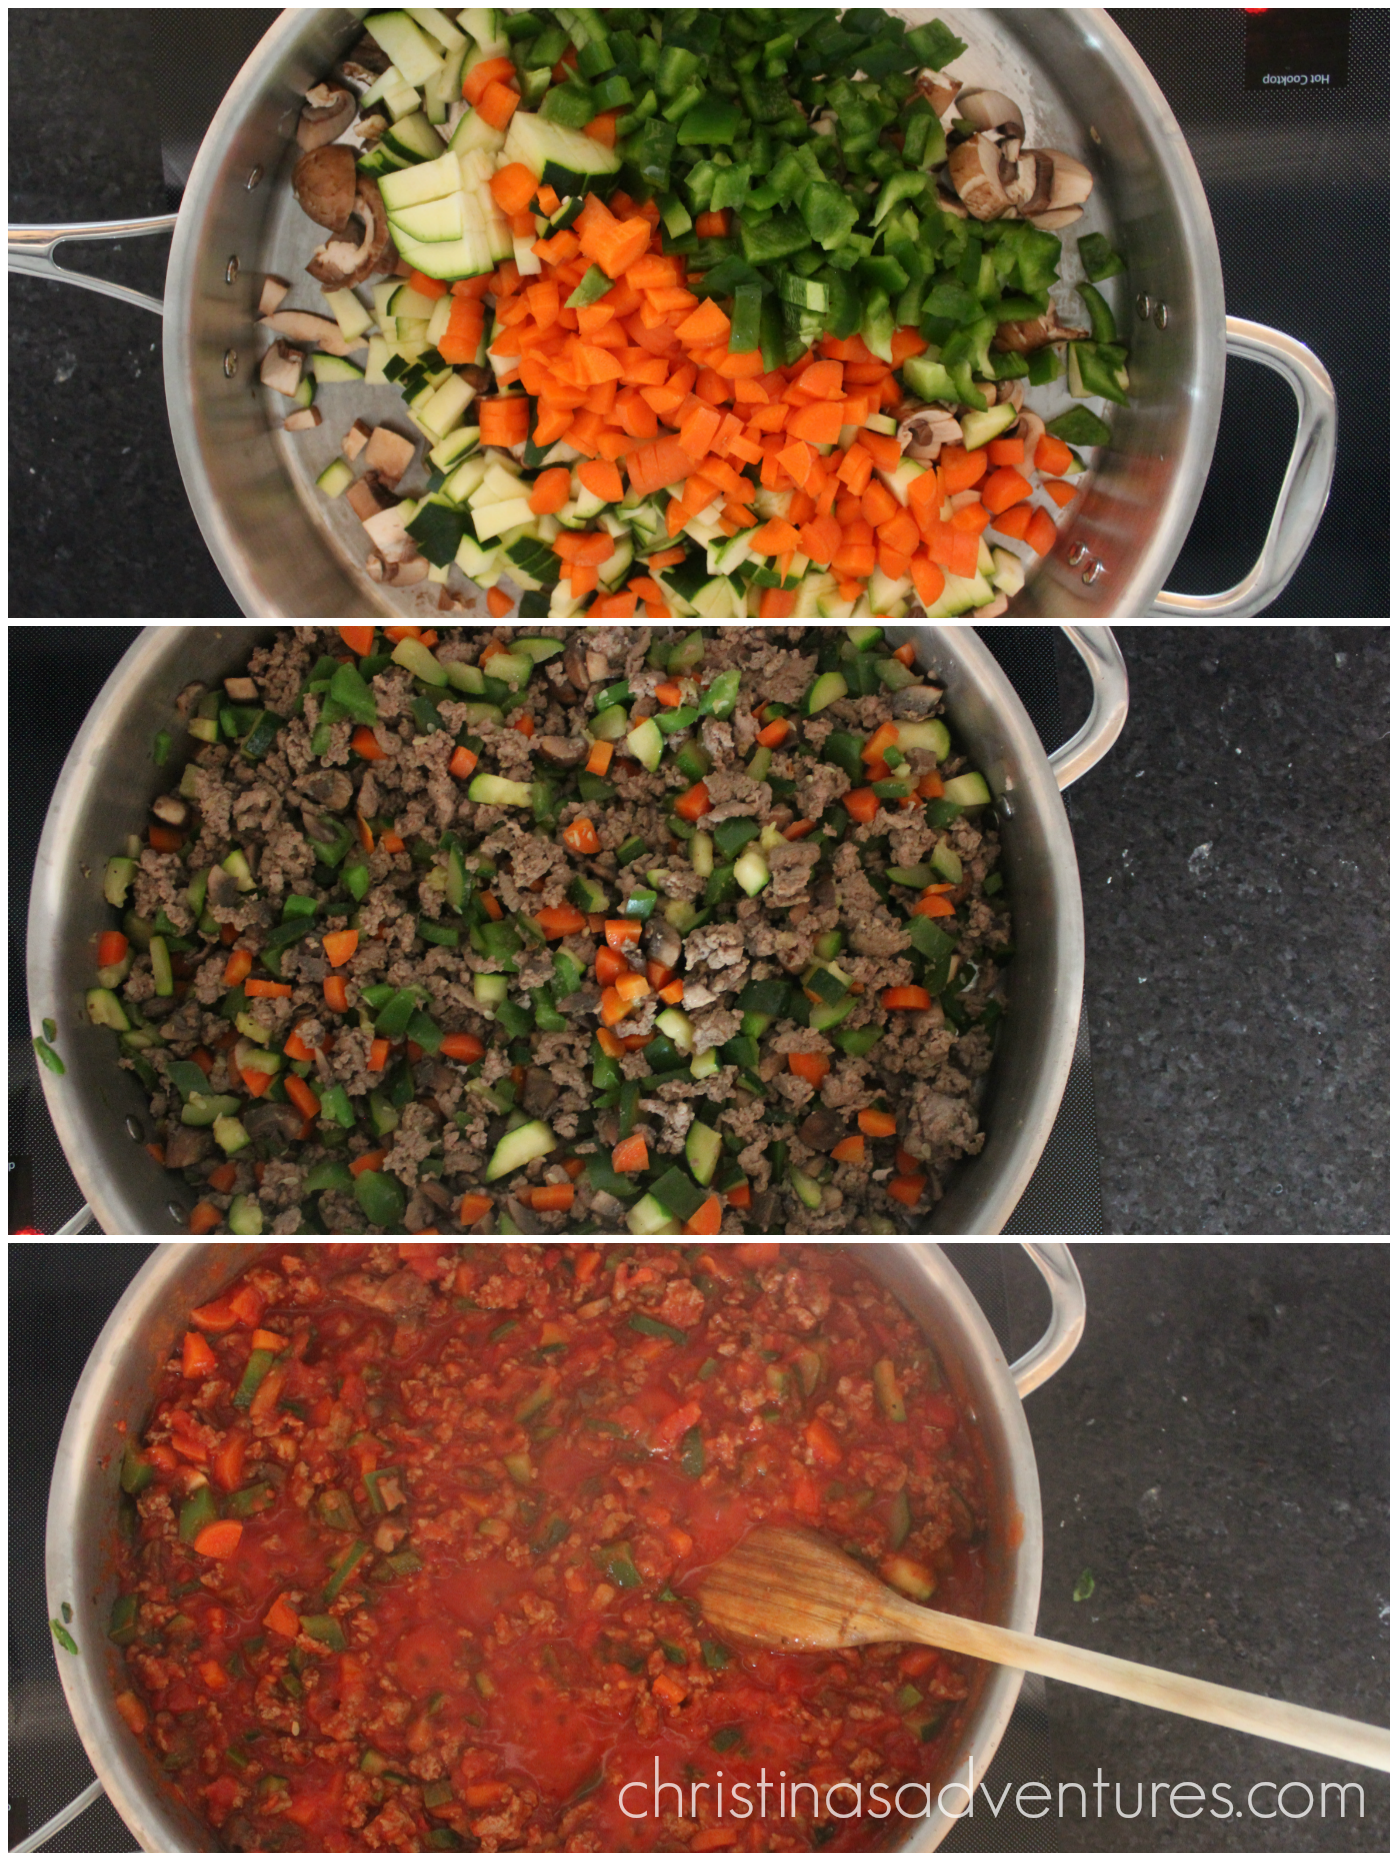 Veggie-Packed Tomato Sauce